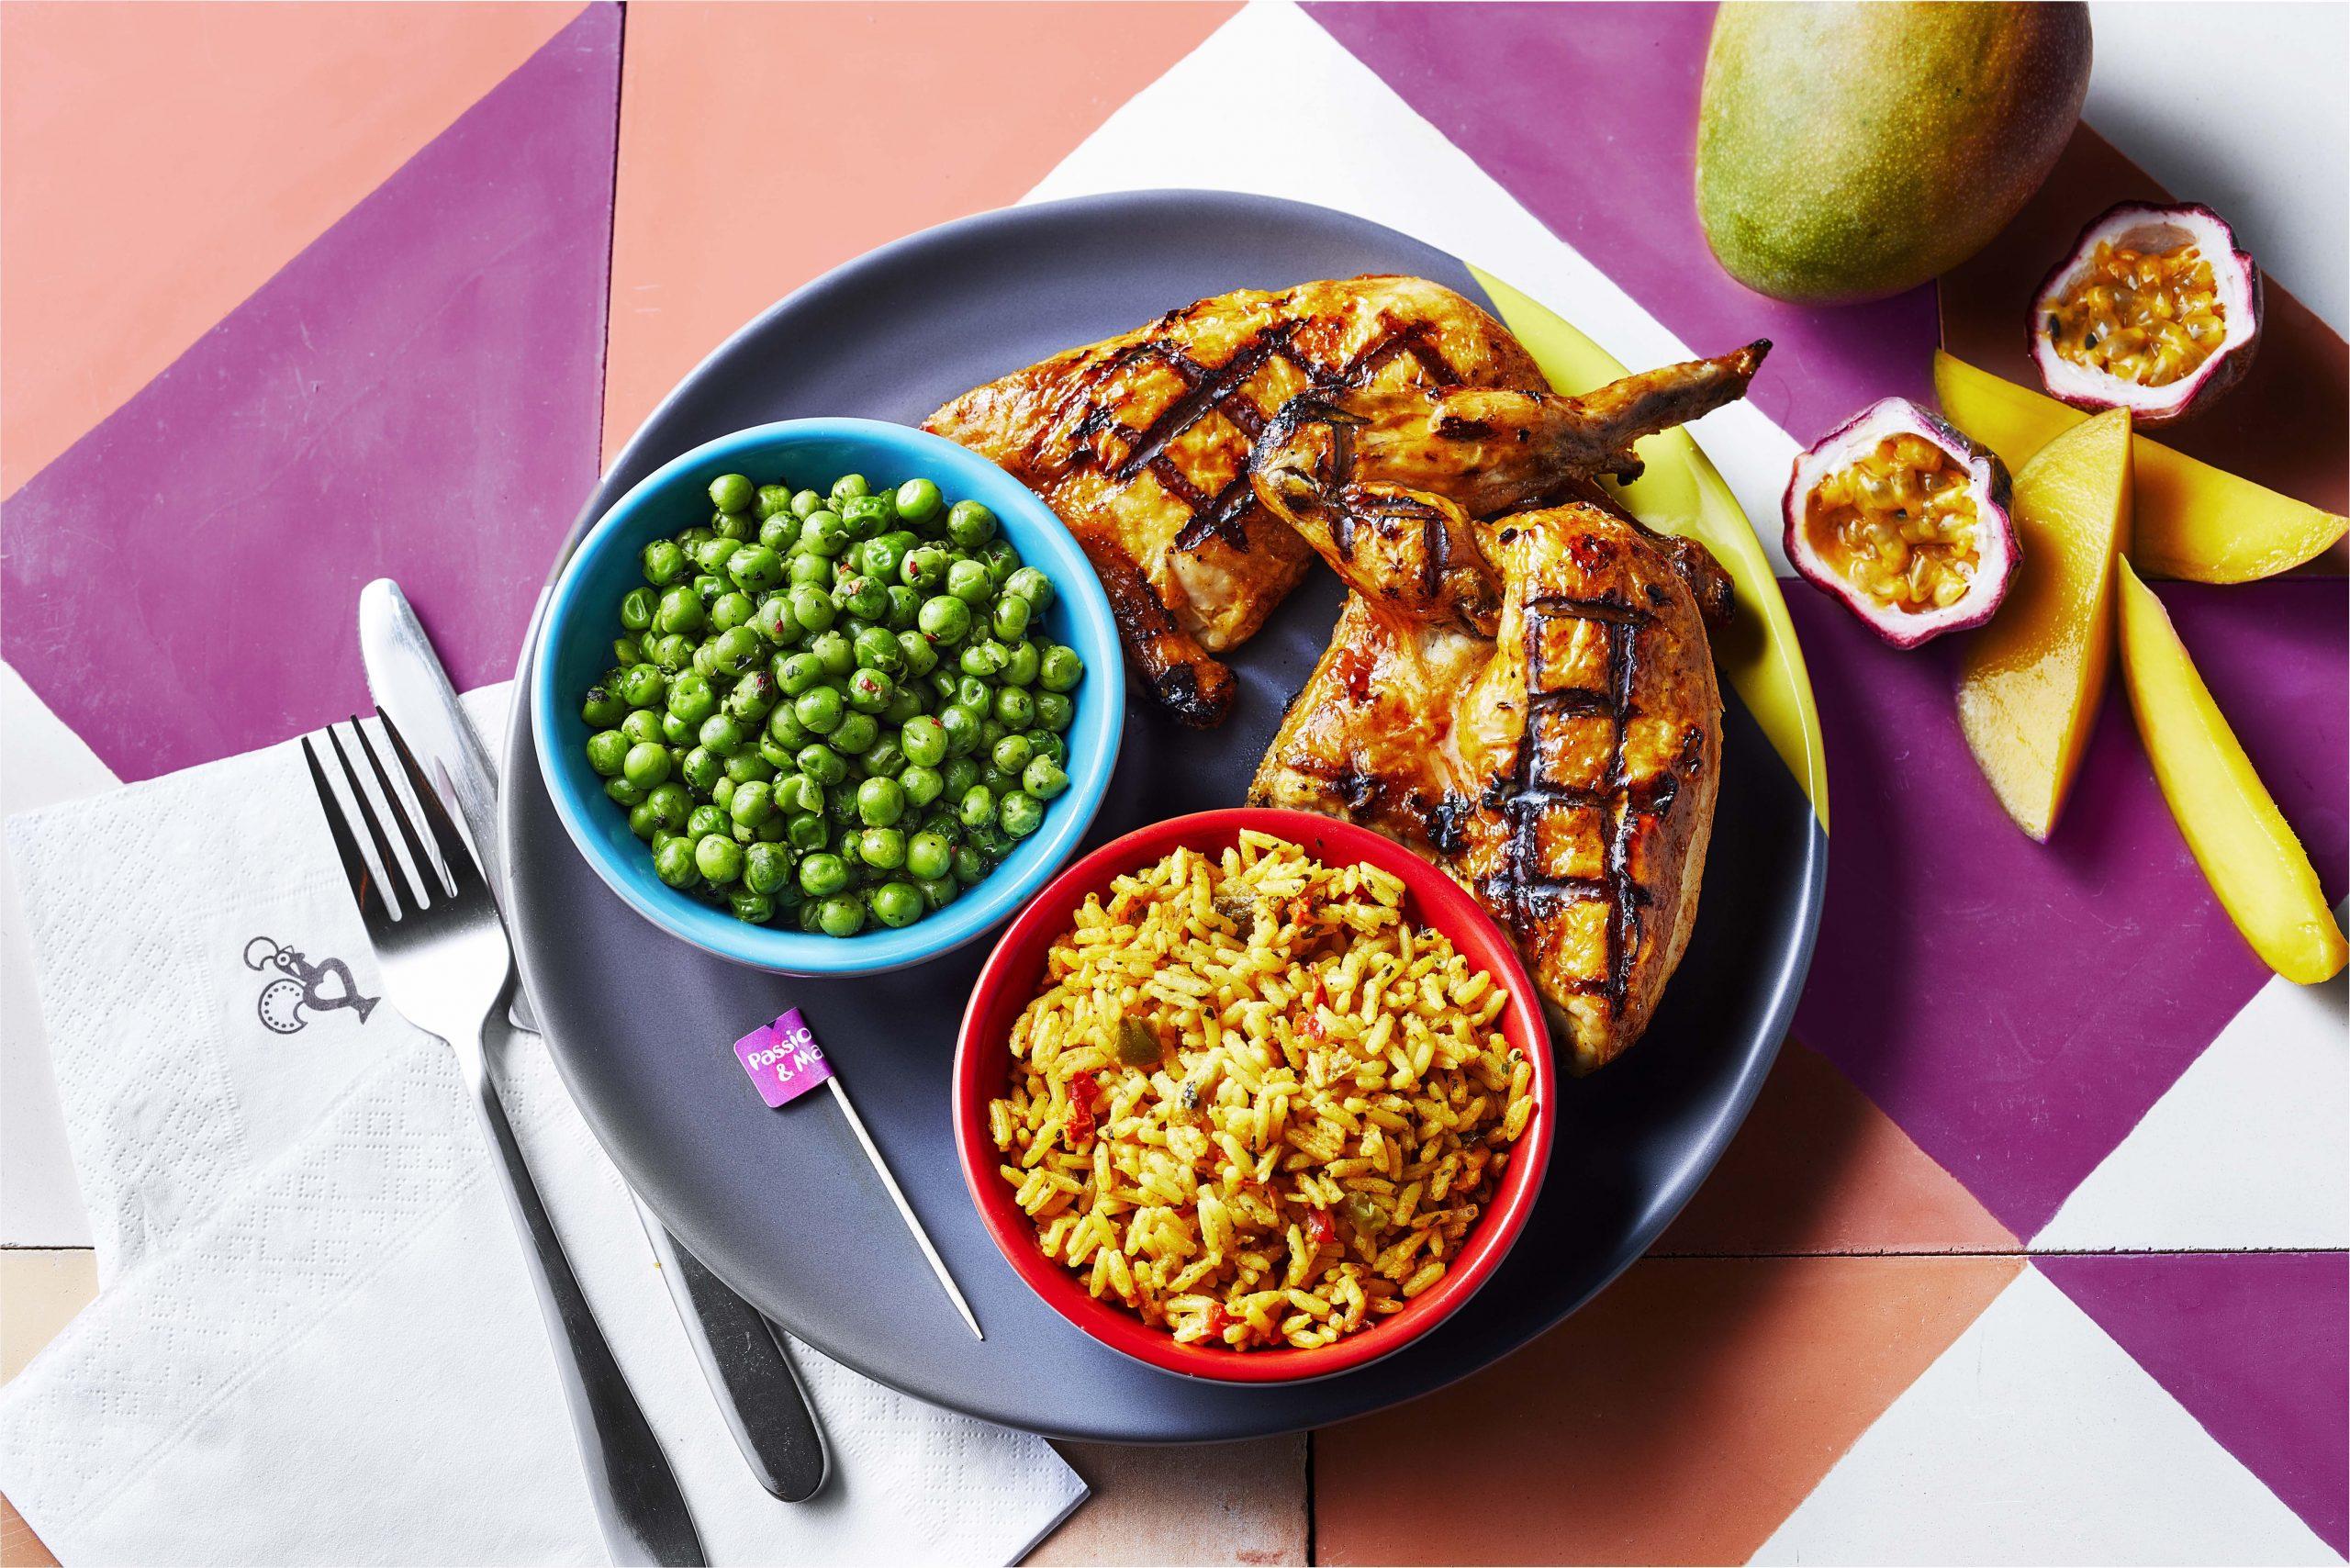 nandos chicken on a plate